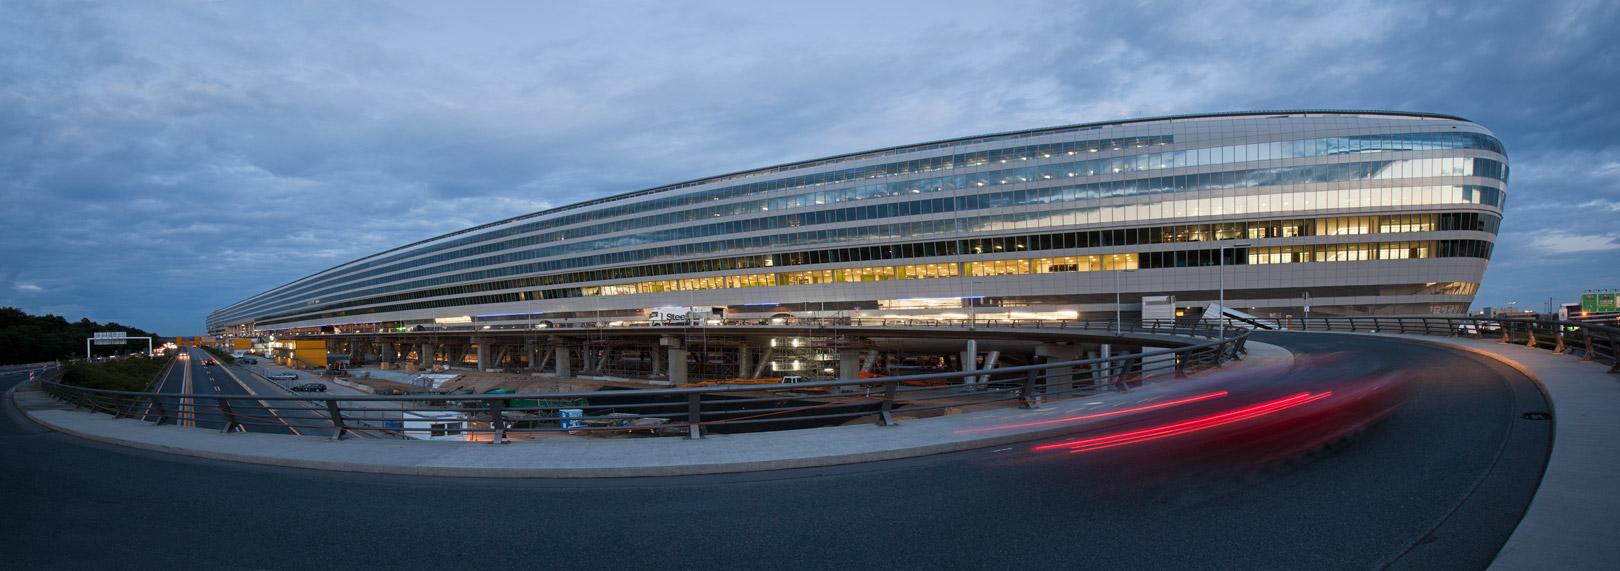 Squaire Building, Frankfurt Flughafen